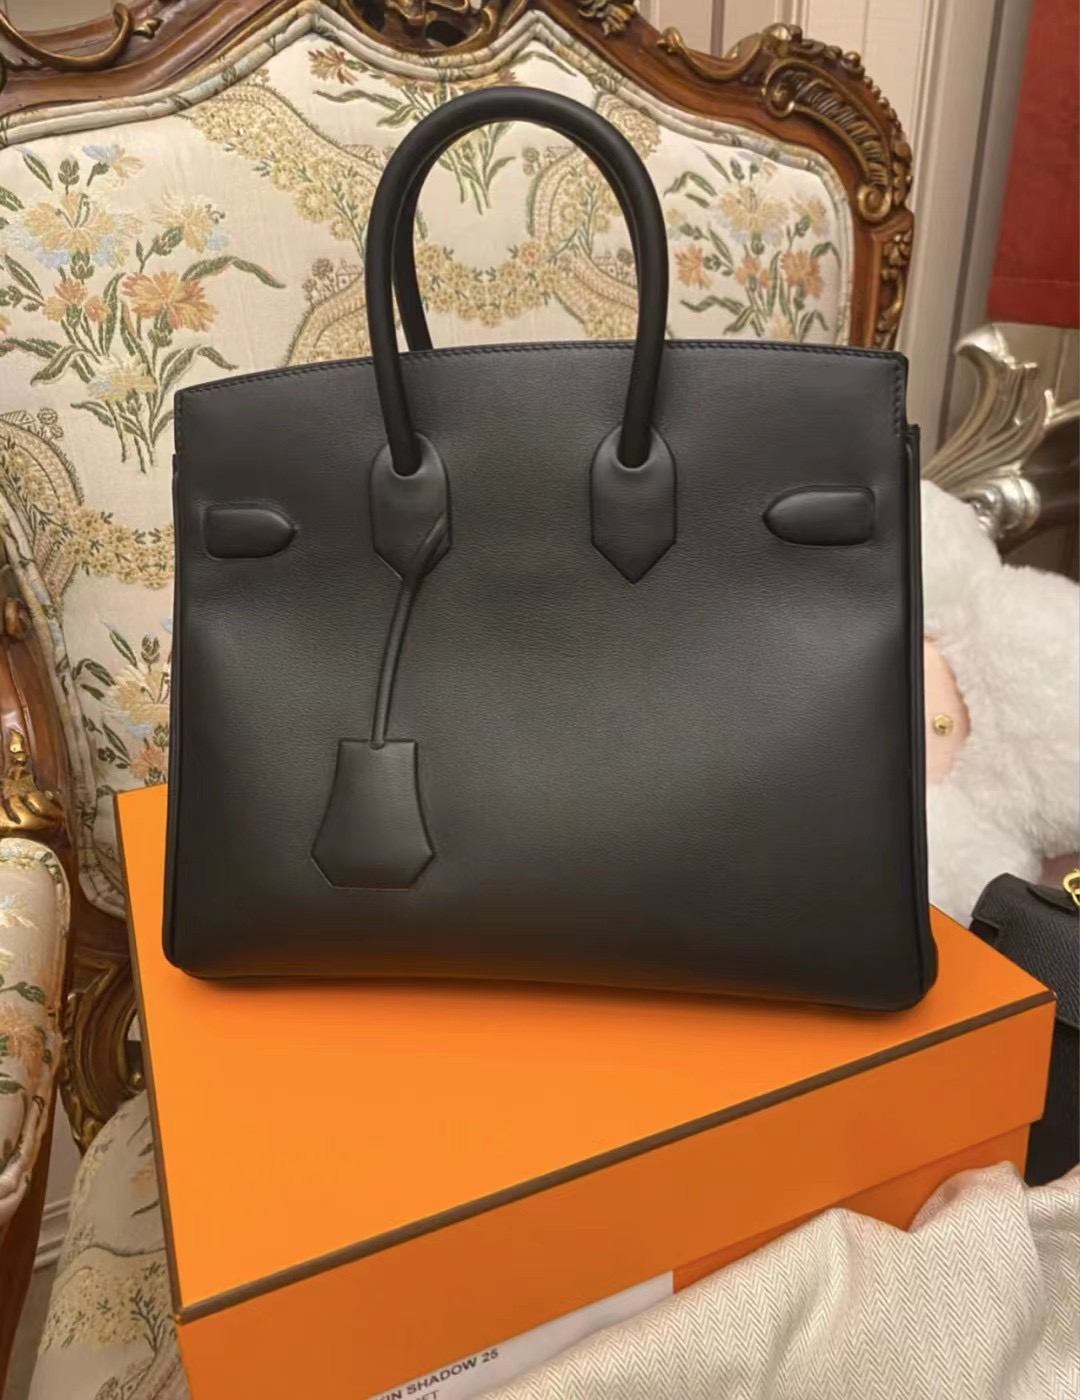 Australia Hermes Birkin Shadow 25cm 幻影 89 Noir 黑色 Swift leather